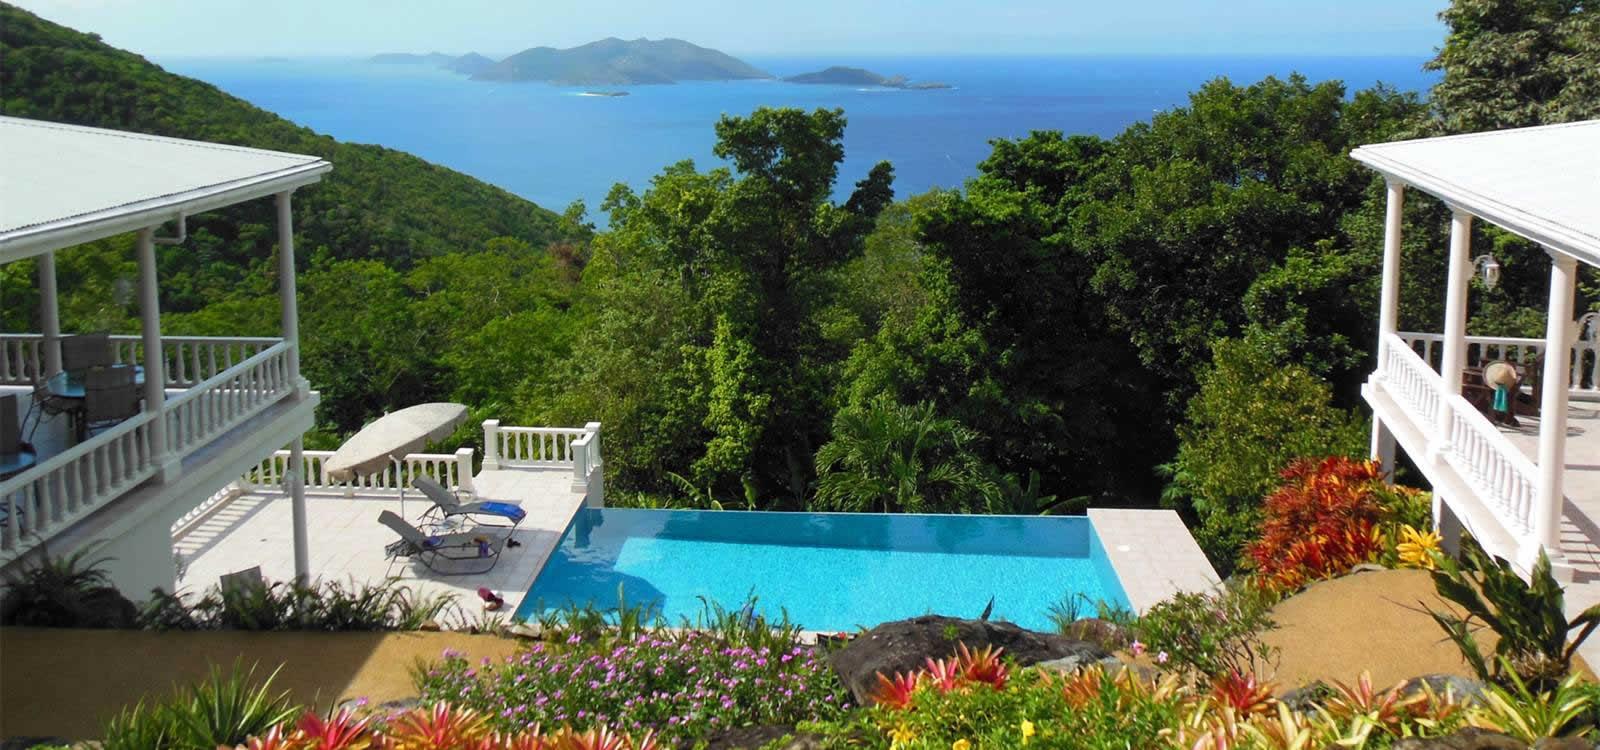 Property For Sale On Montserrat